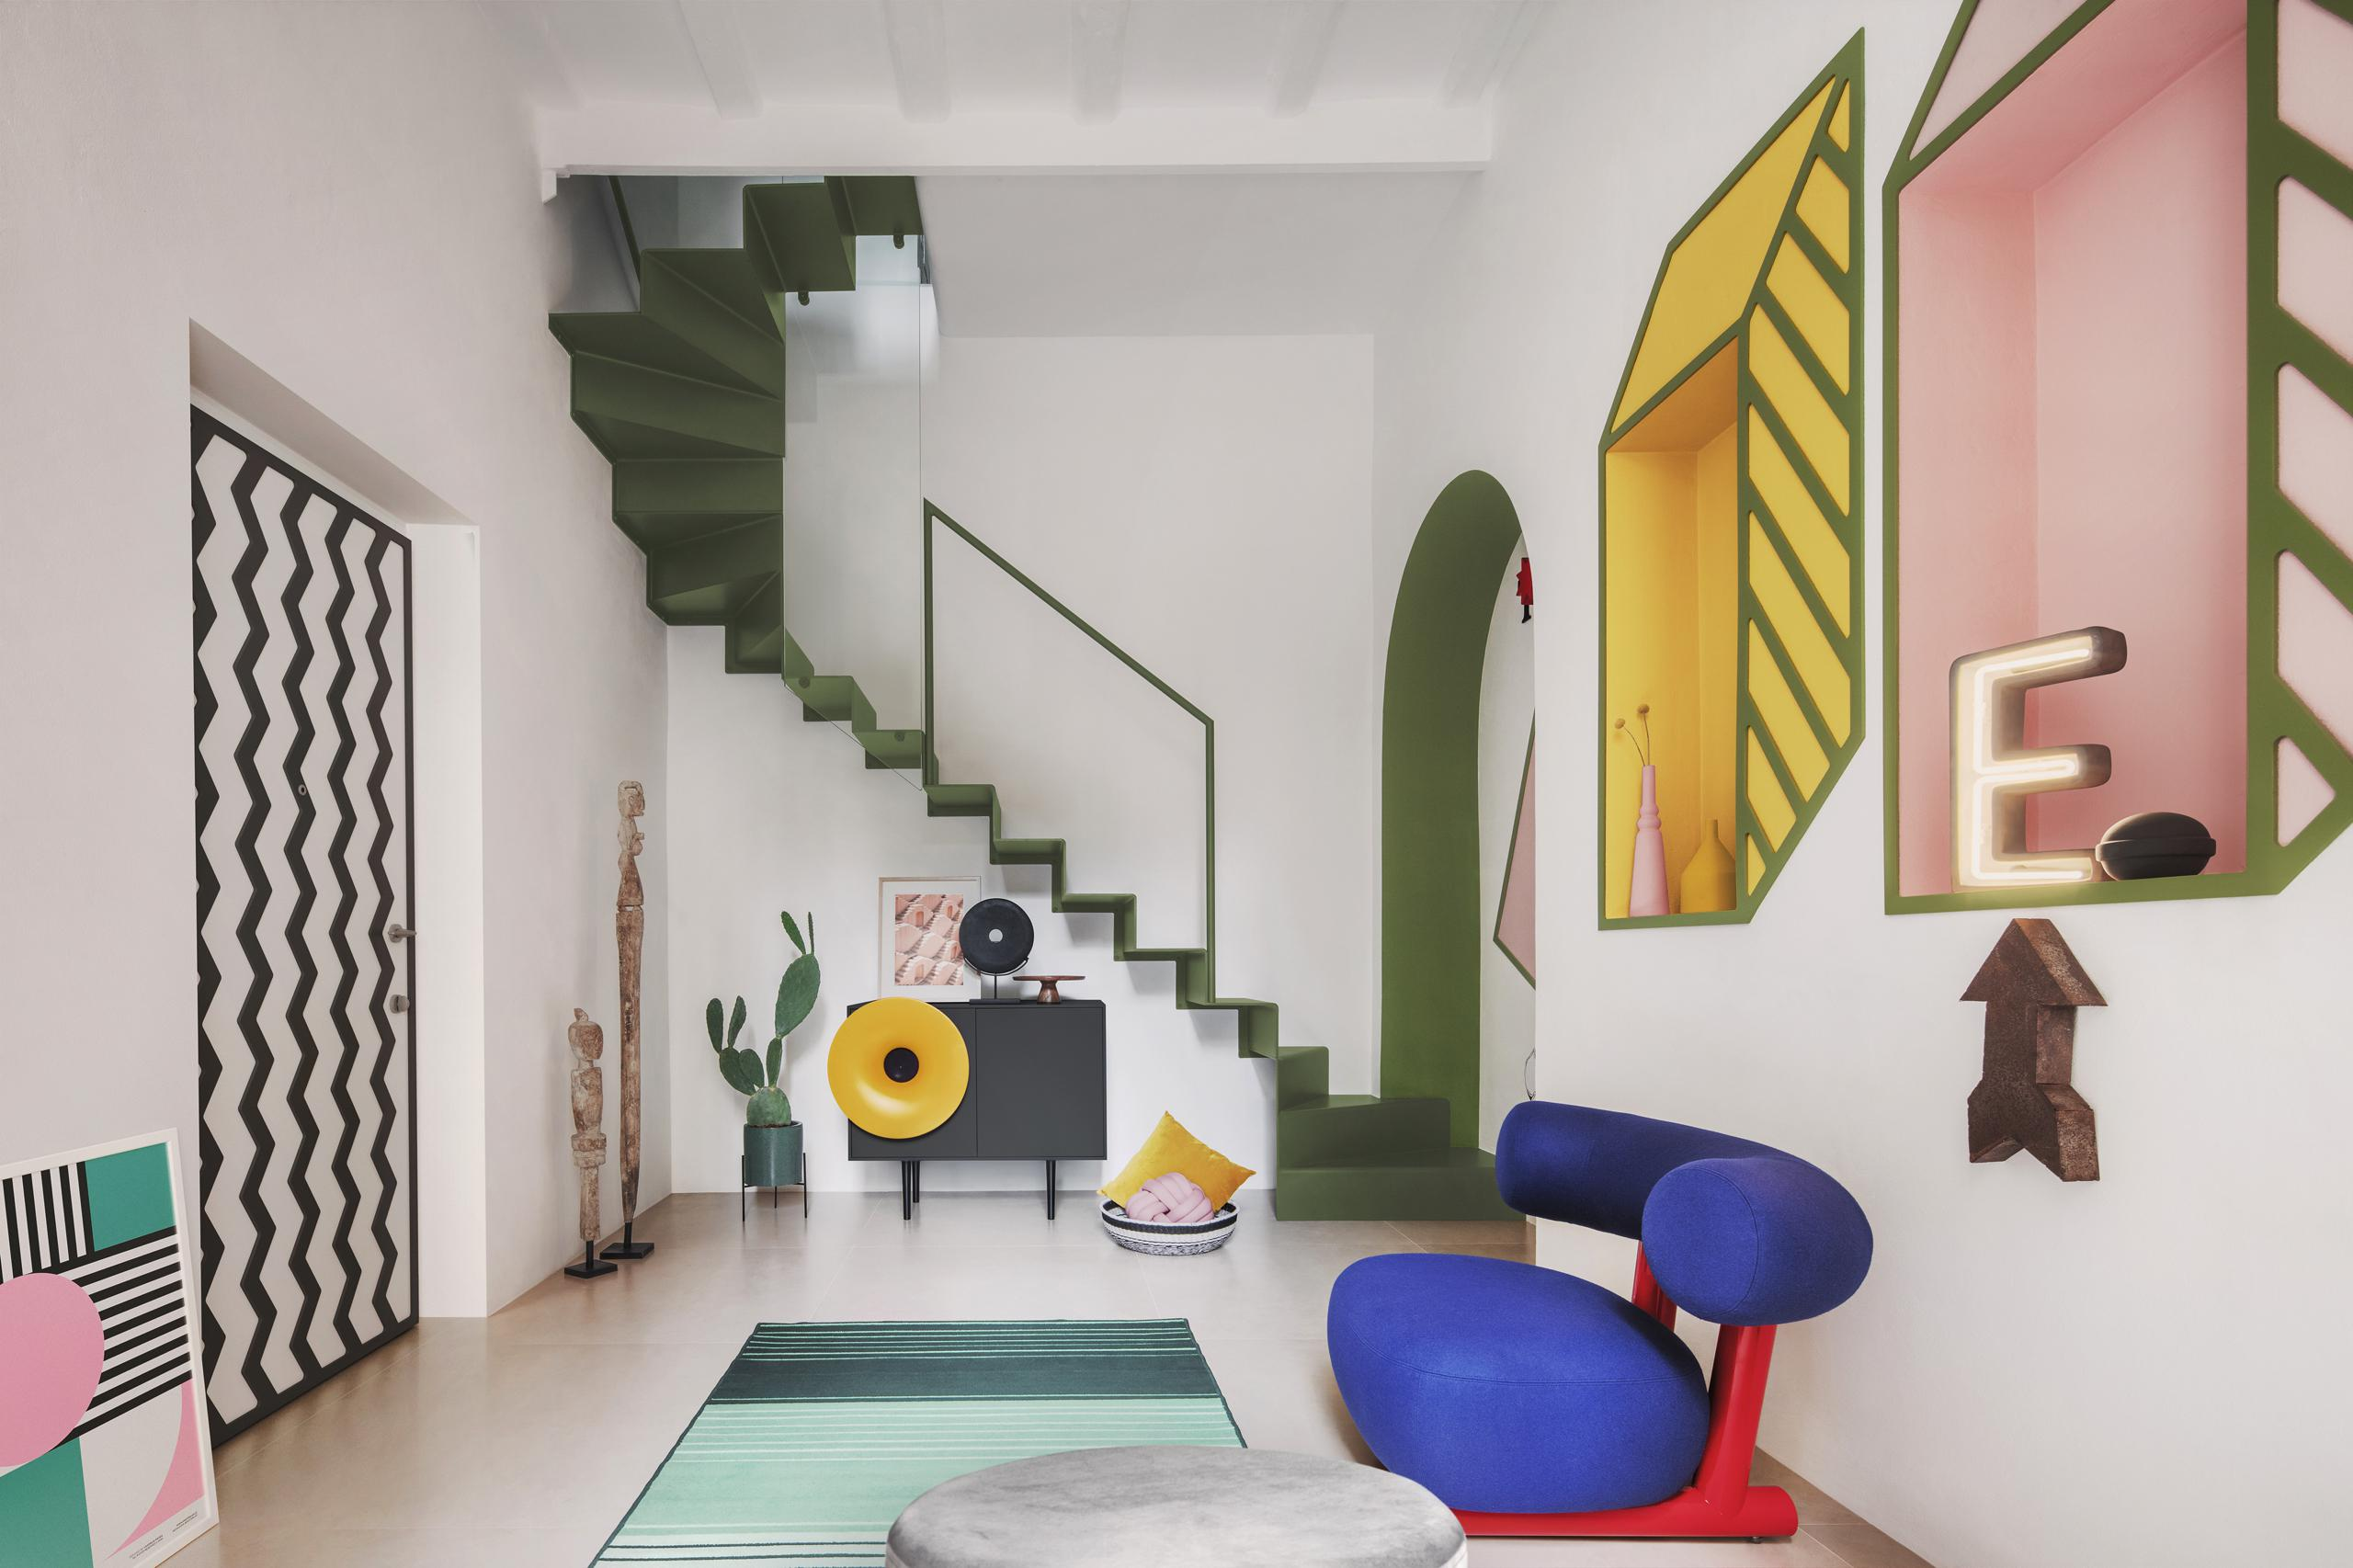 memphis_design-tribute-e.sottsass-studio-paradisiartificiali-decohome_6